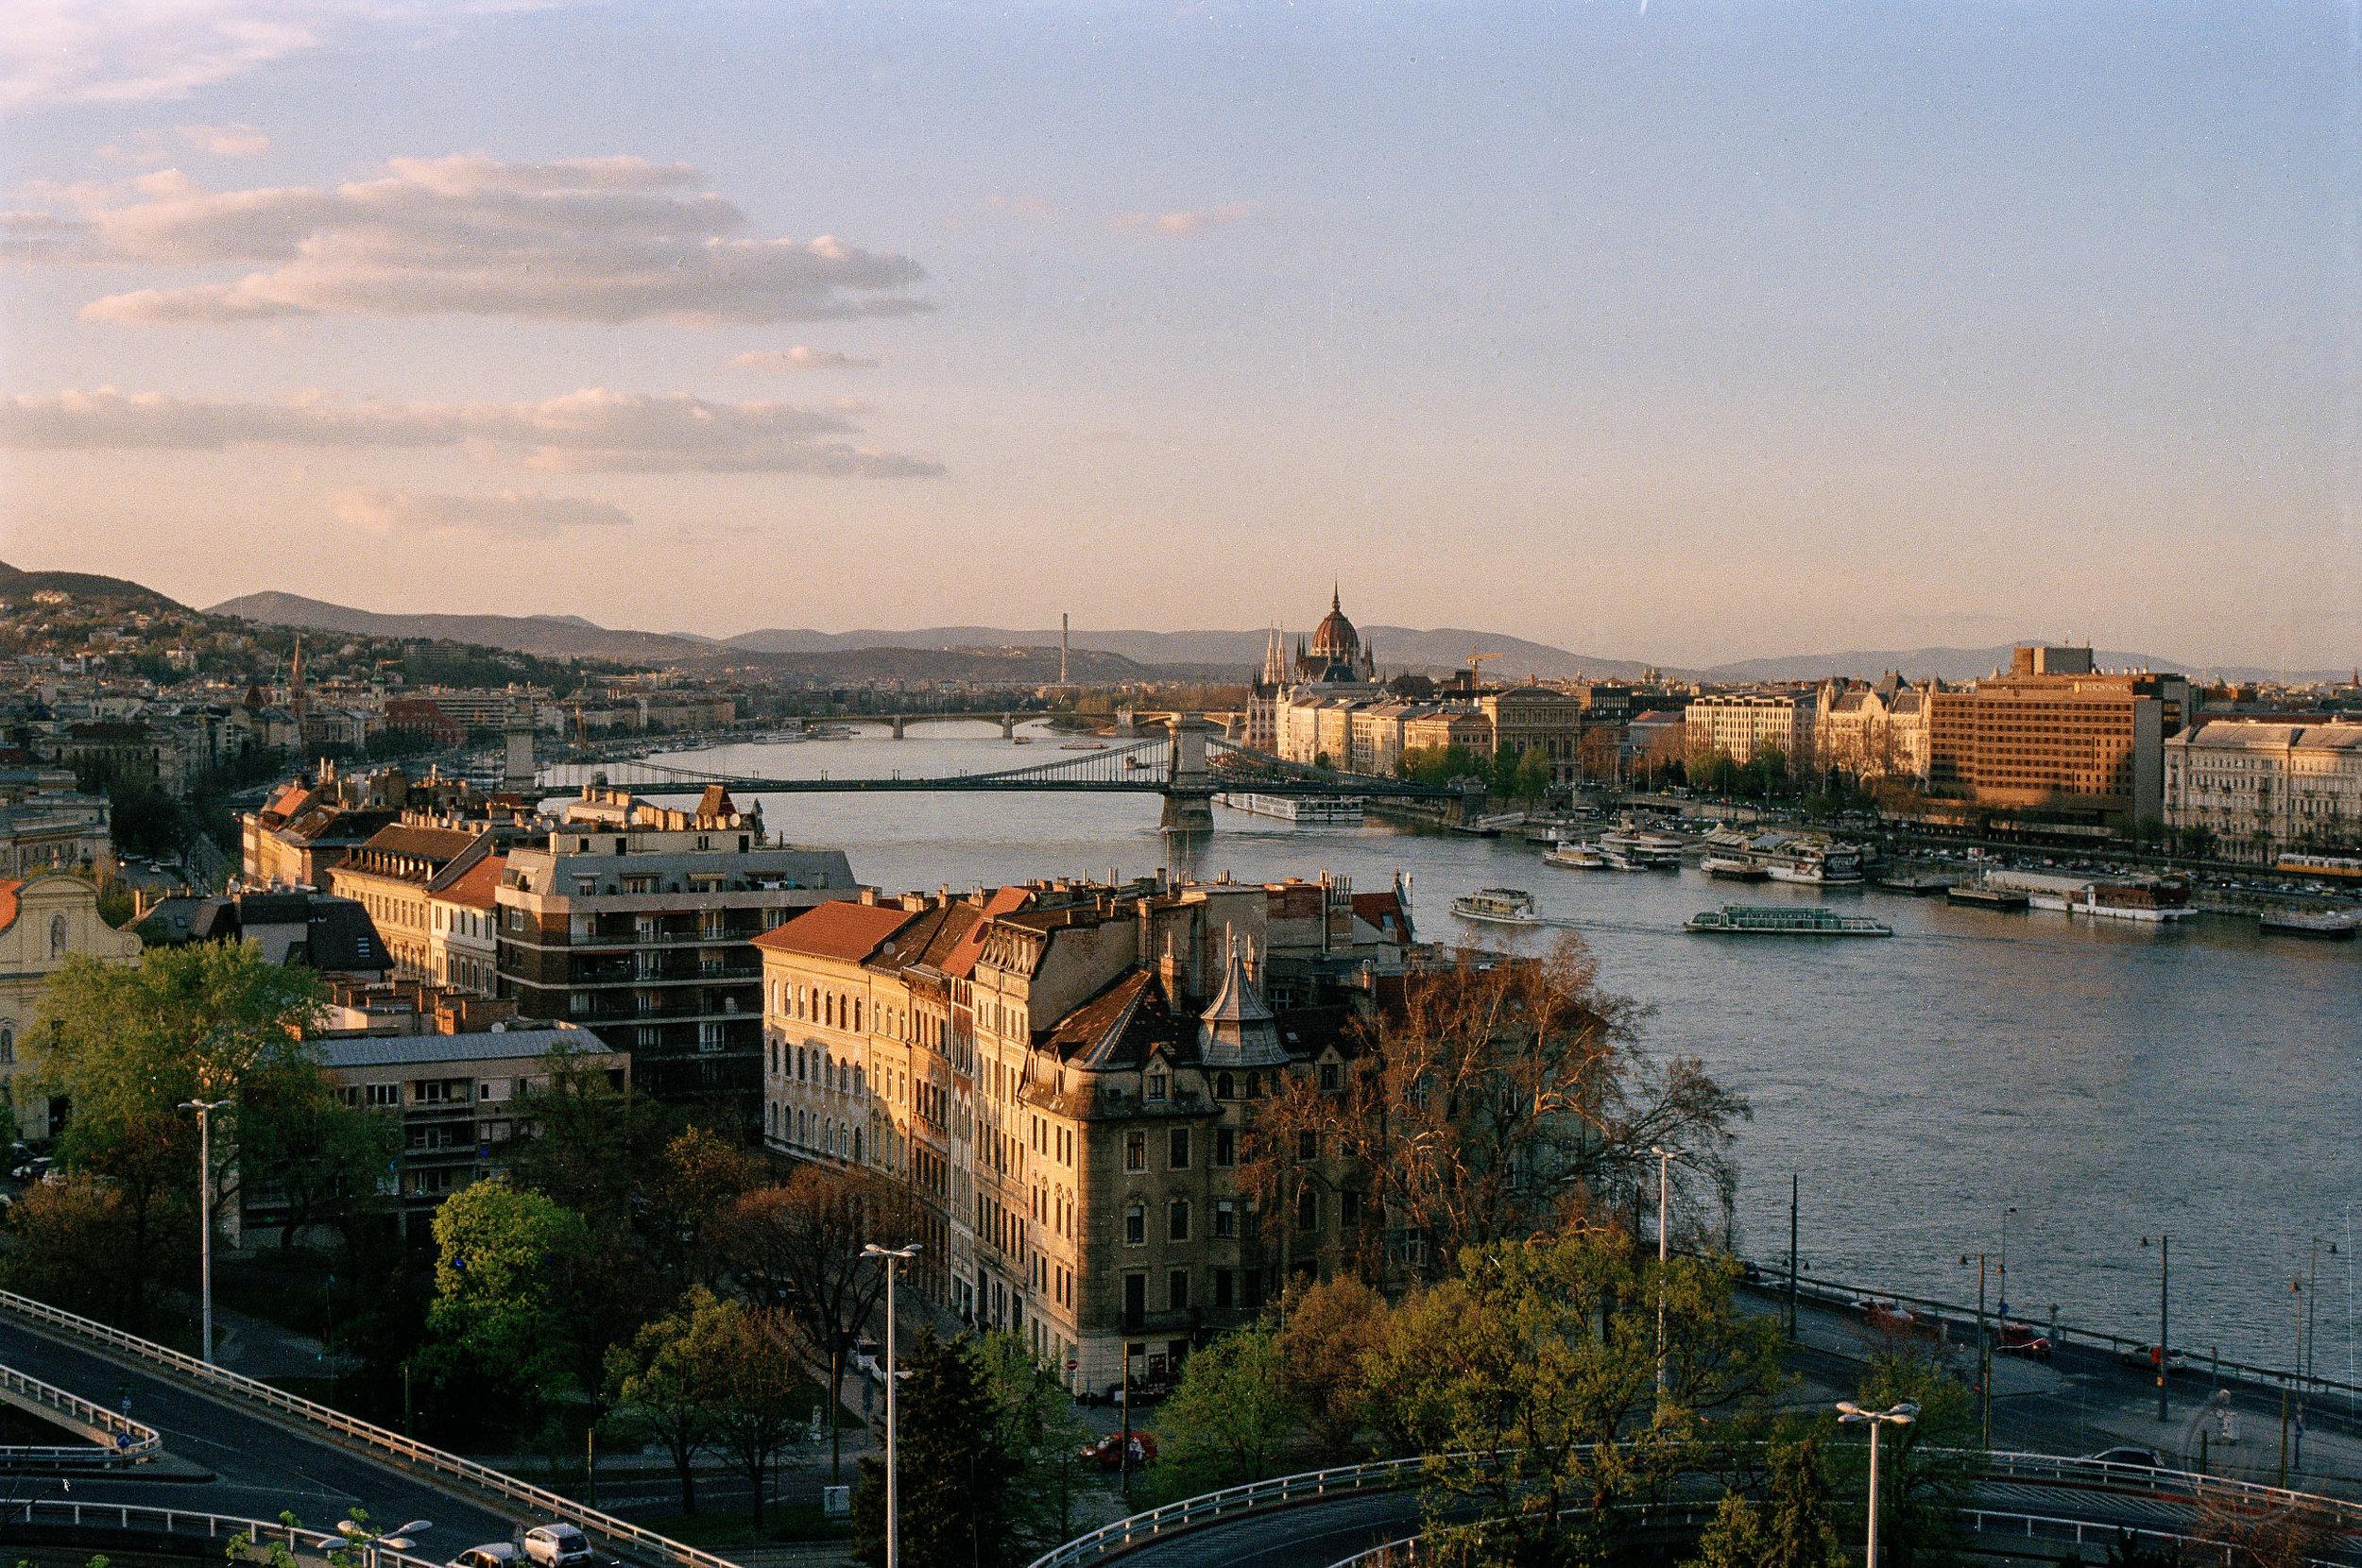 budapest16-2.jpg